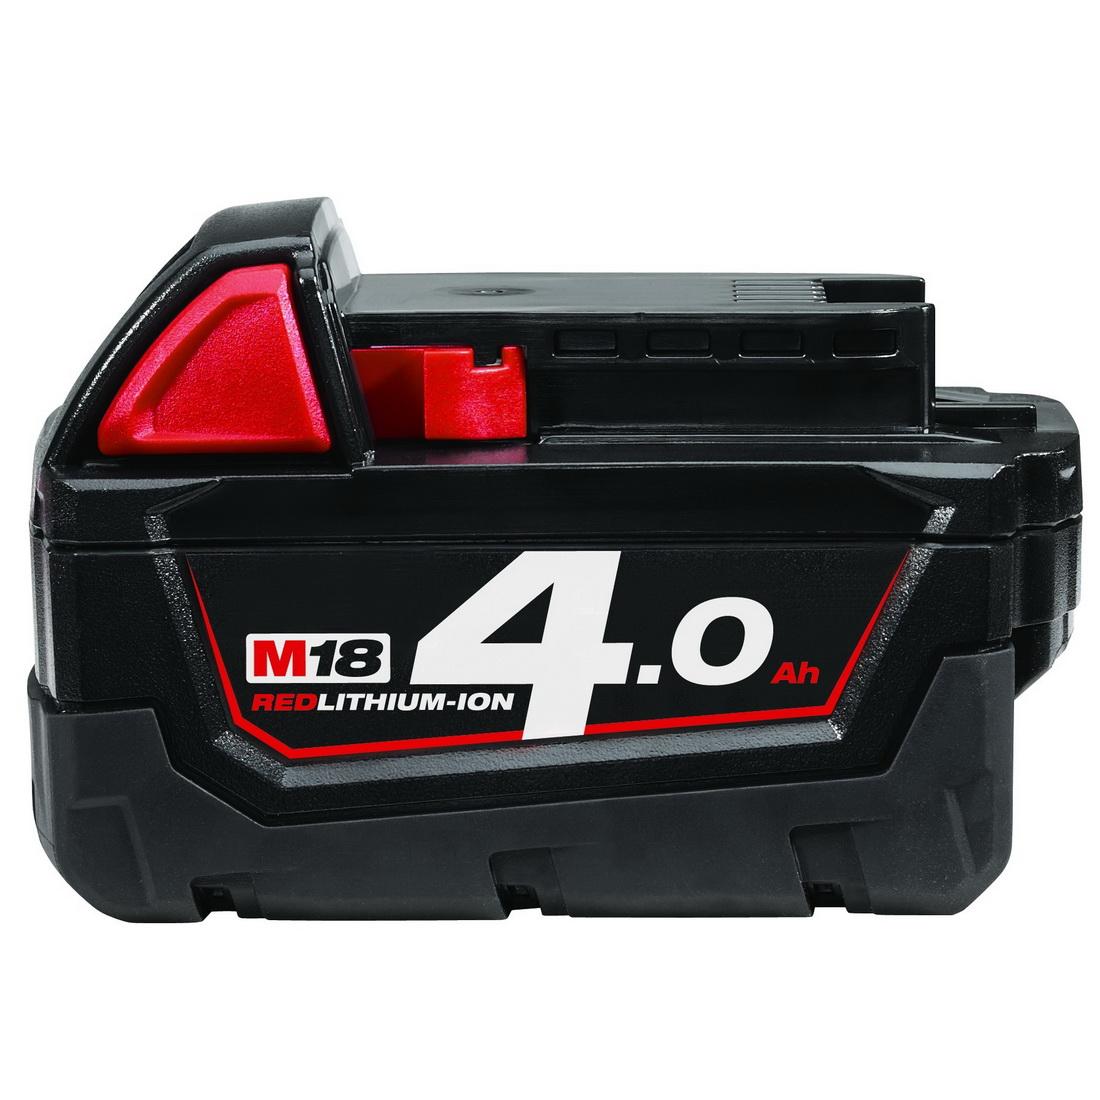 M18 REDLITHIUM -ION Battery 4.0Ah